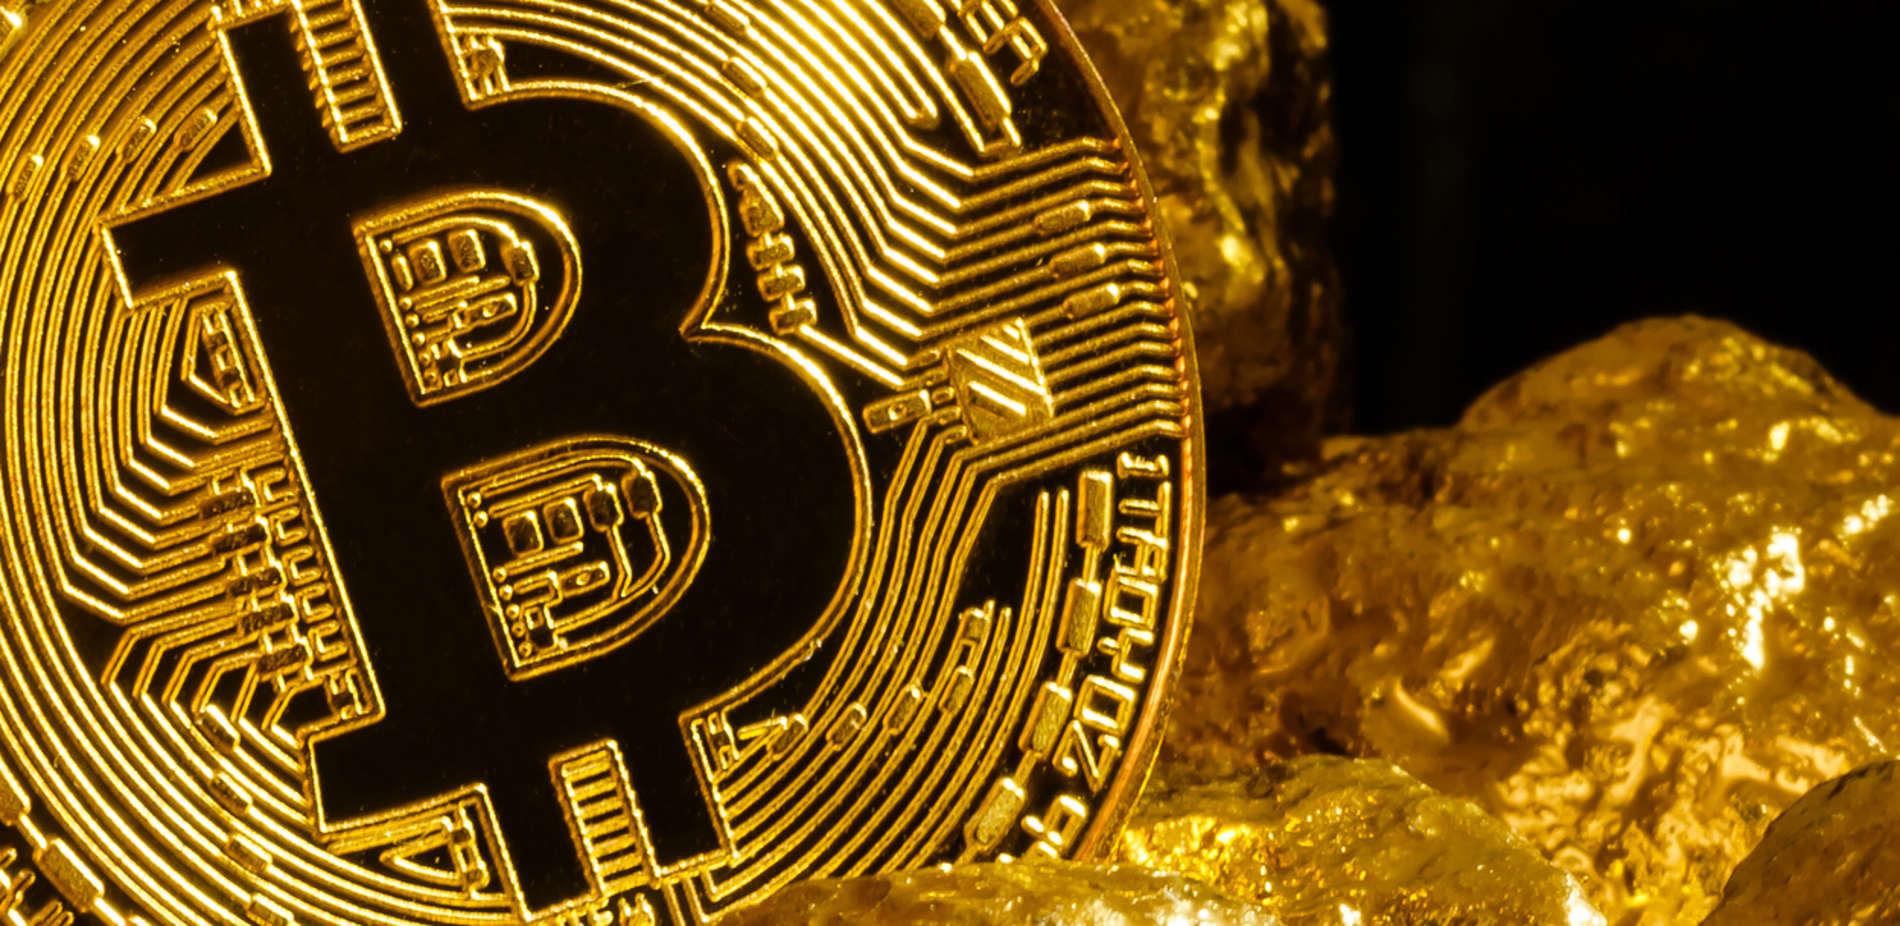 Gold Vs Bitcoin Can Bitcoin Replace Gold As An Asset